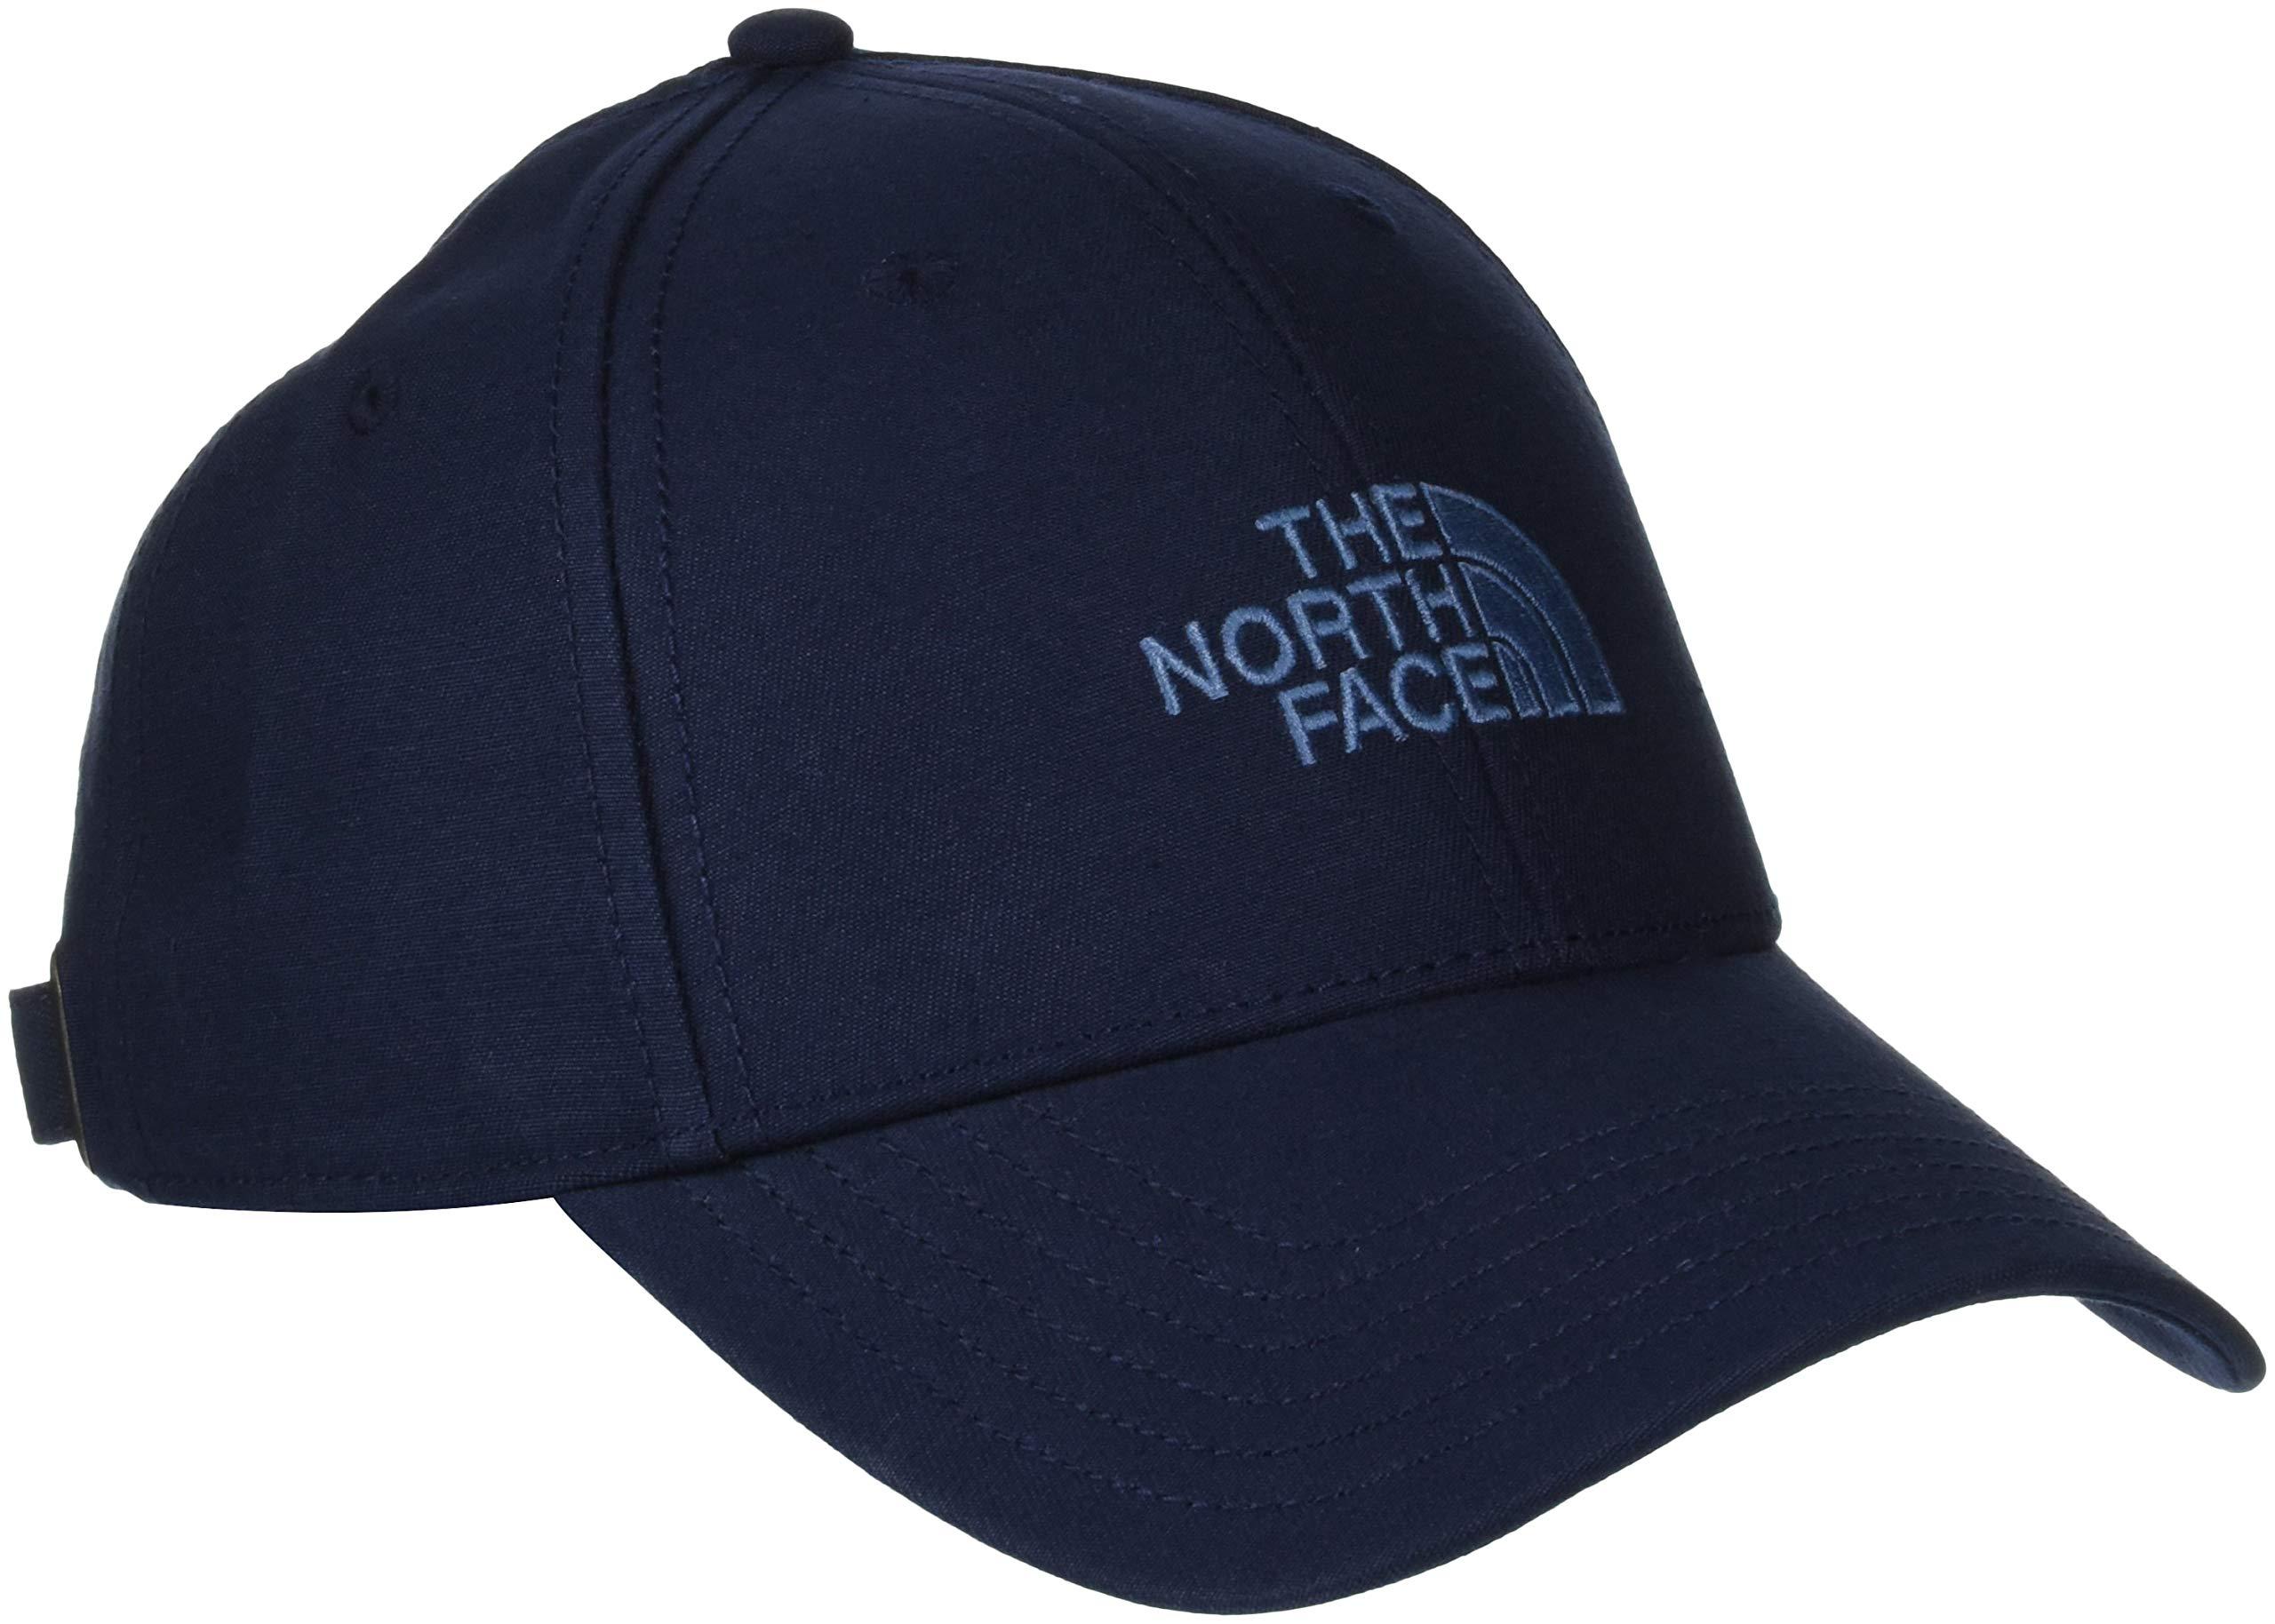 The North Face Ascentials TNF Gorra 66 Classic, Unisex adulto, Shady Blue/Gull Blue, Talla única